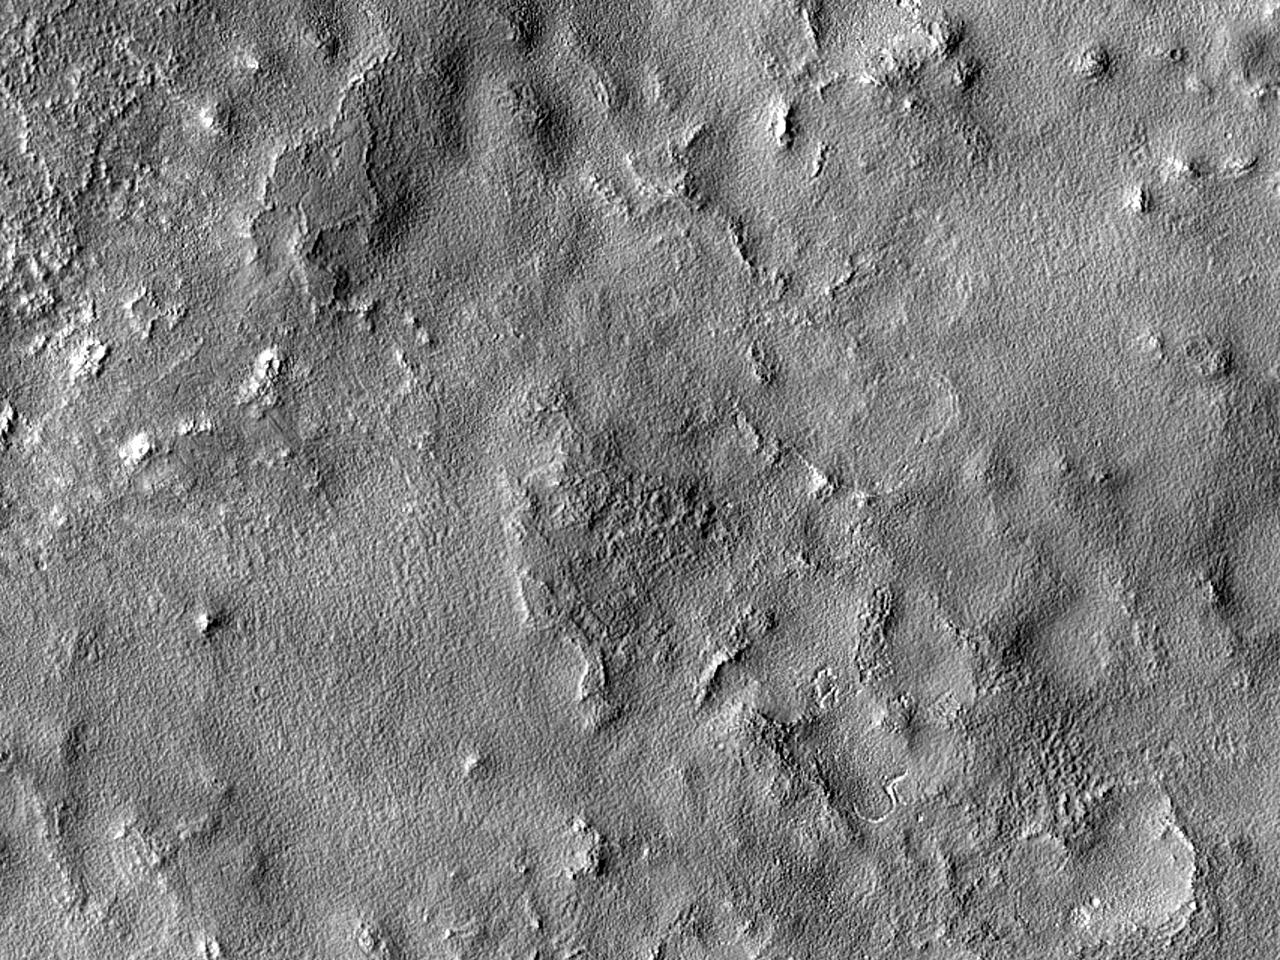 Terenla Vest de Erebus Montes